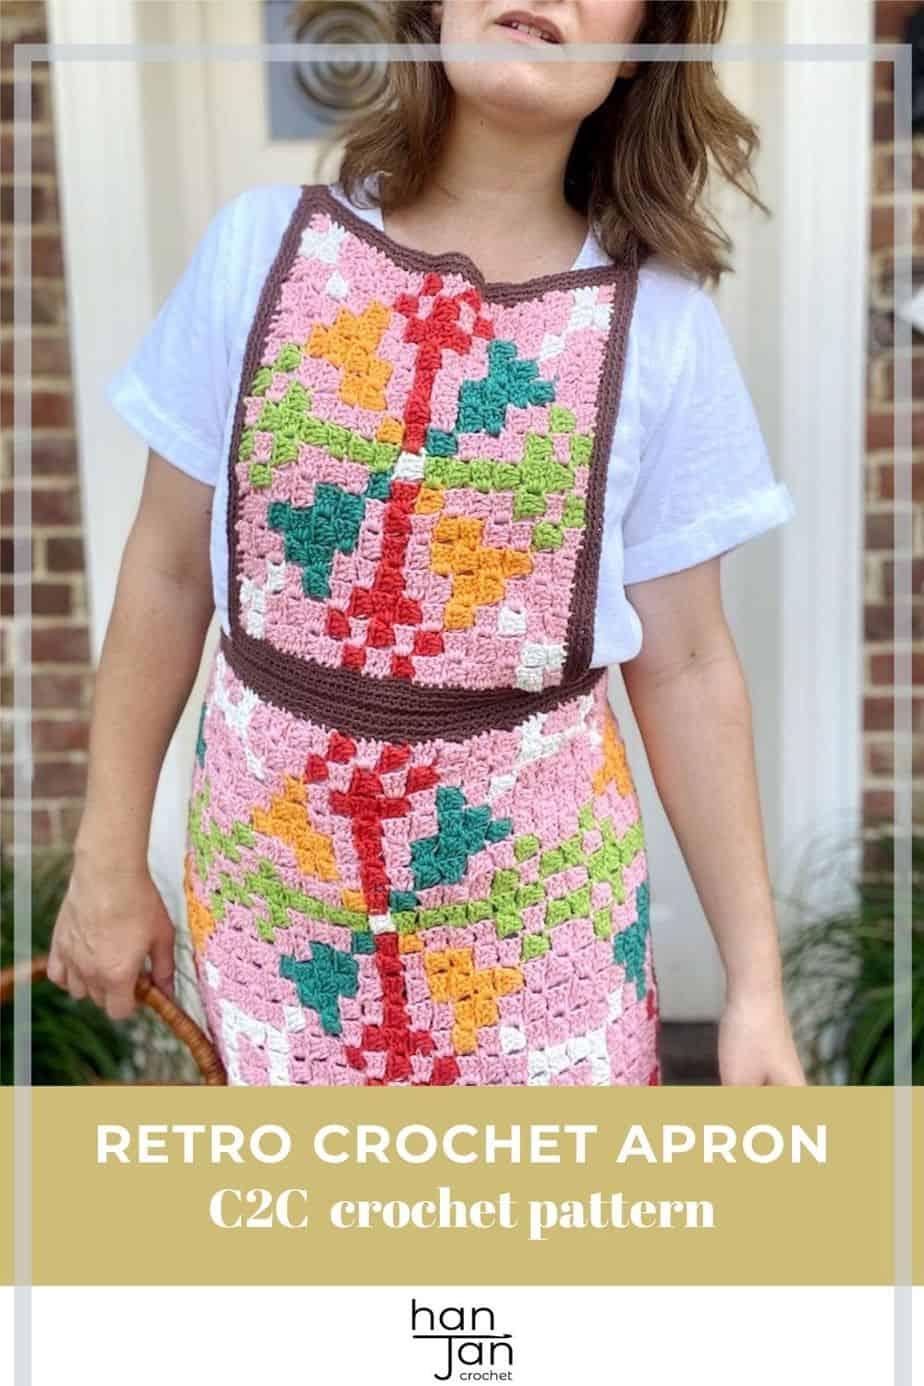 C2C Crochet Apron Pattern